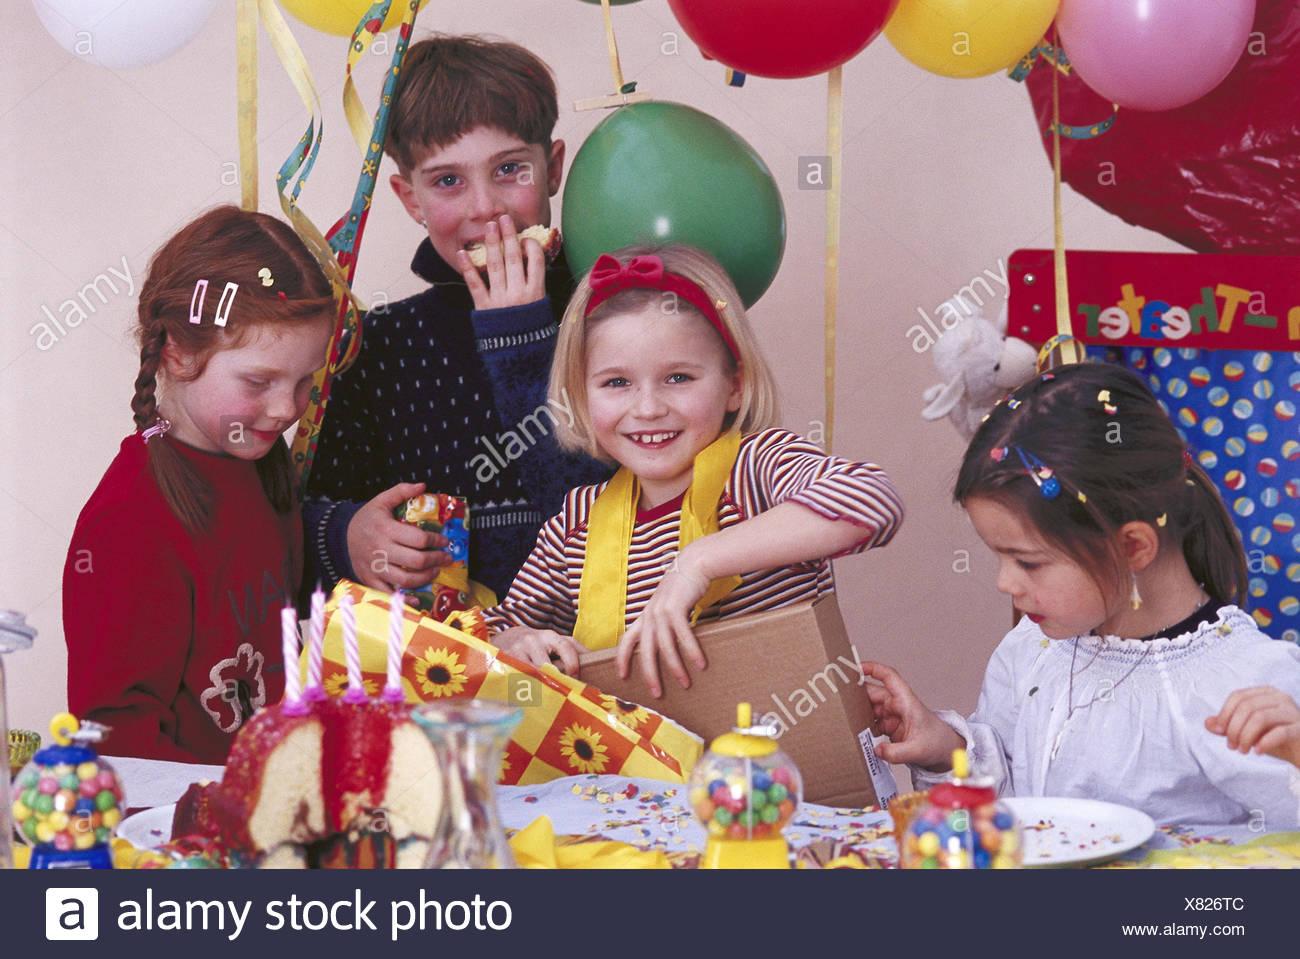 children s birthday party girl present talk birthday